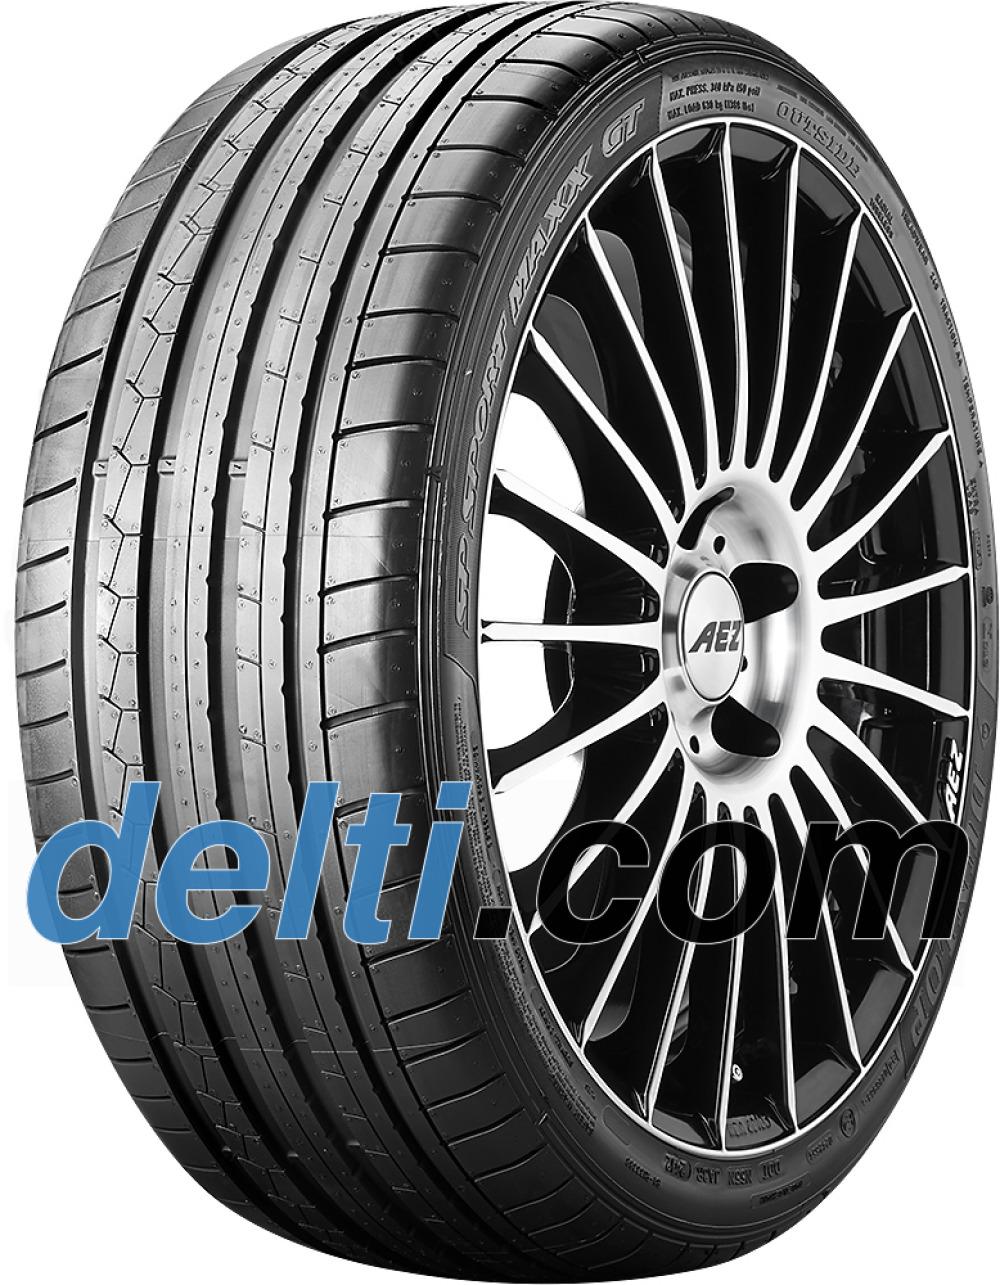 Dunlop SP Sport Maxx GT ( 275/30 ZR21 (98Y) XL met velgrandbescherming (MFS), RO1 )